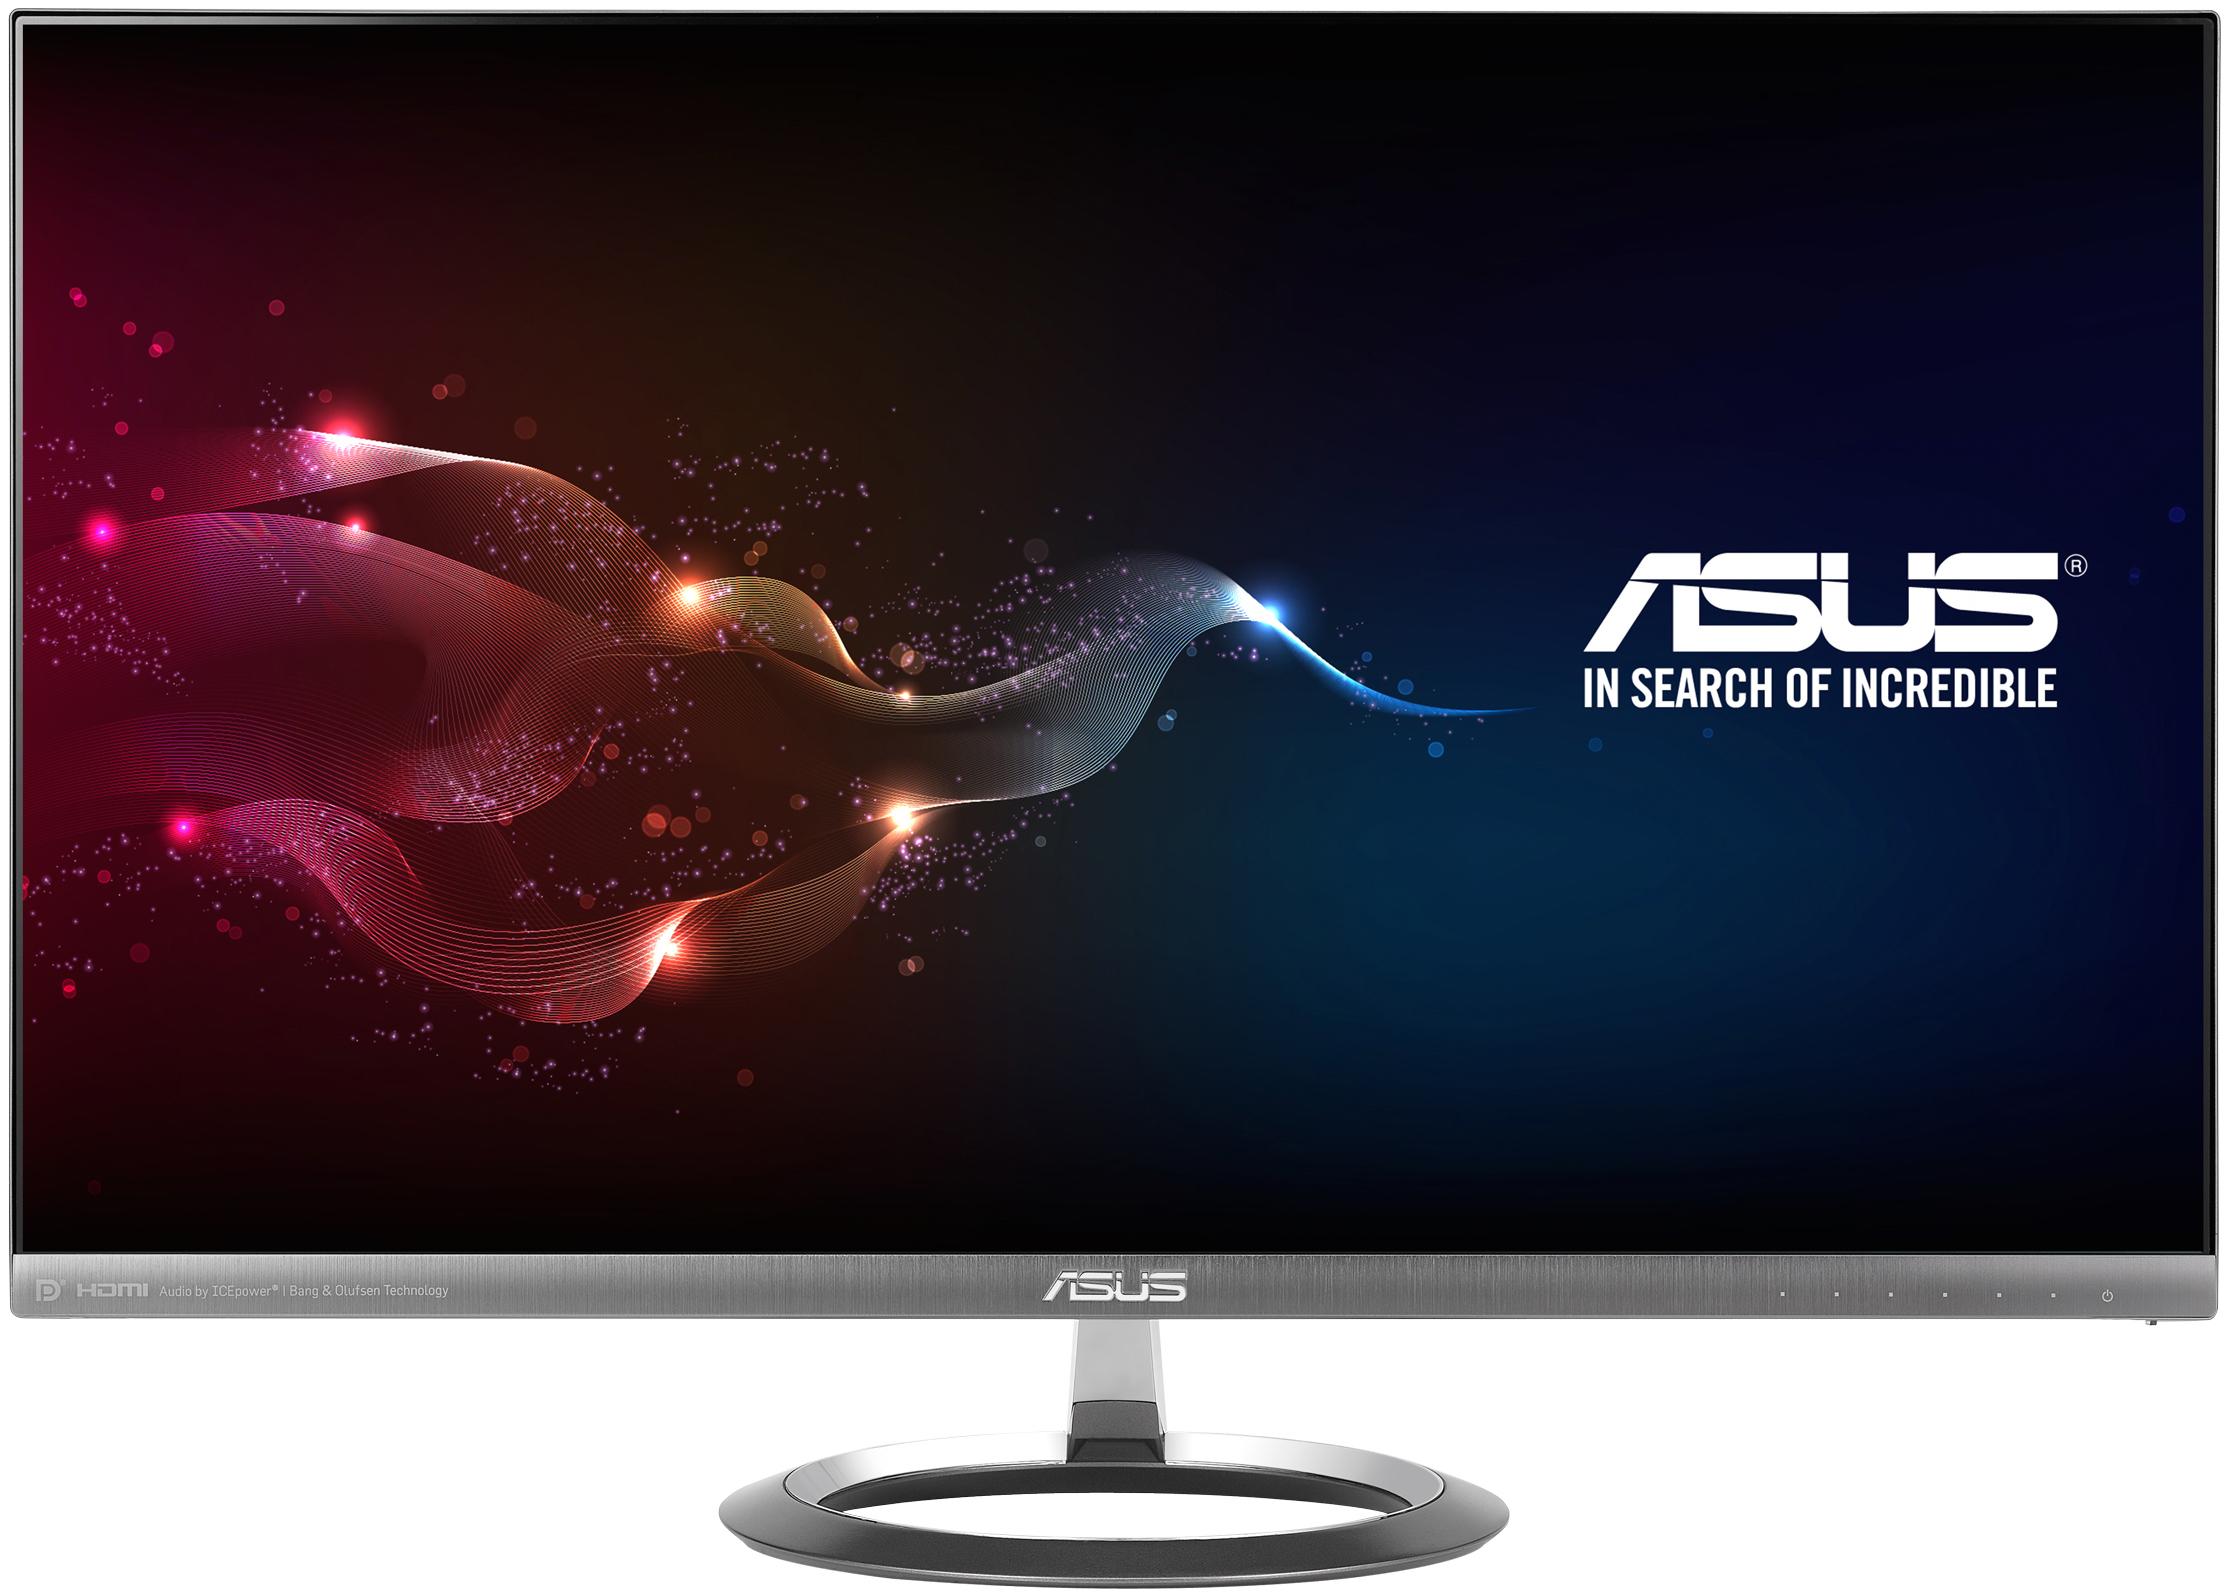 Asus Mx27aq 27 Quot Widescreen Led Ips Monitor 2560x1440 Slim